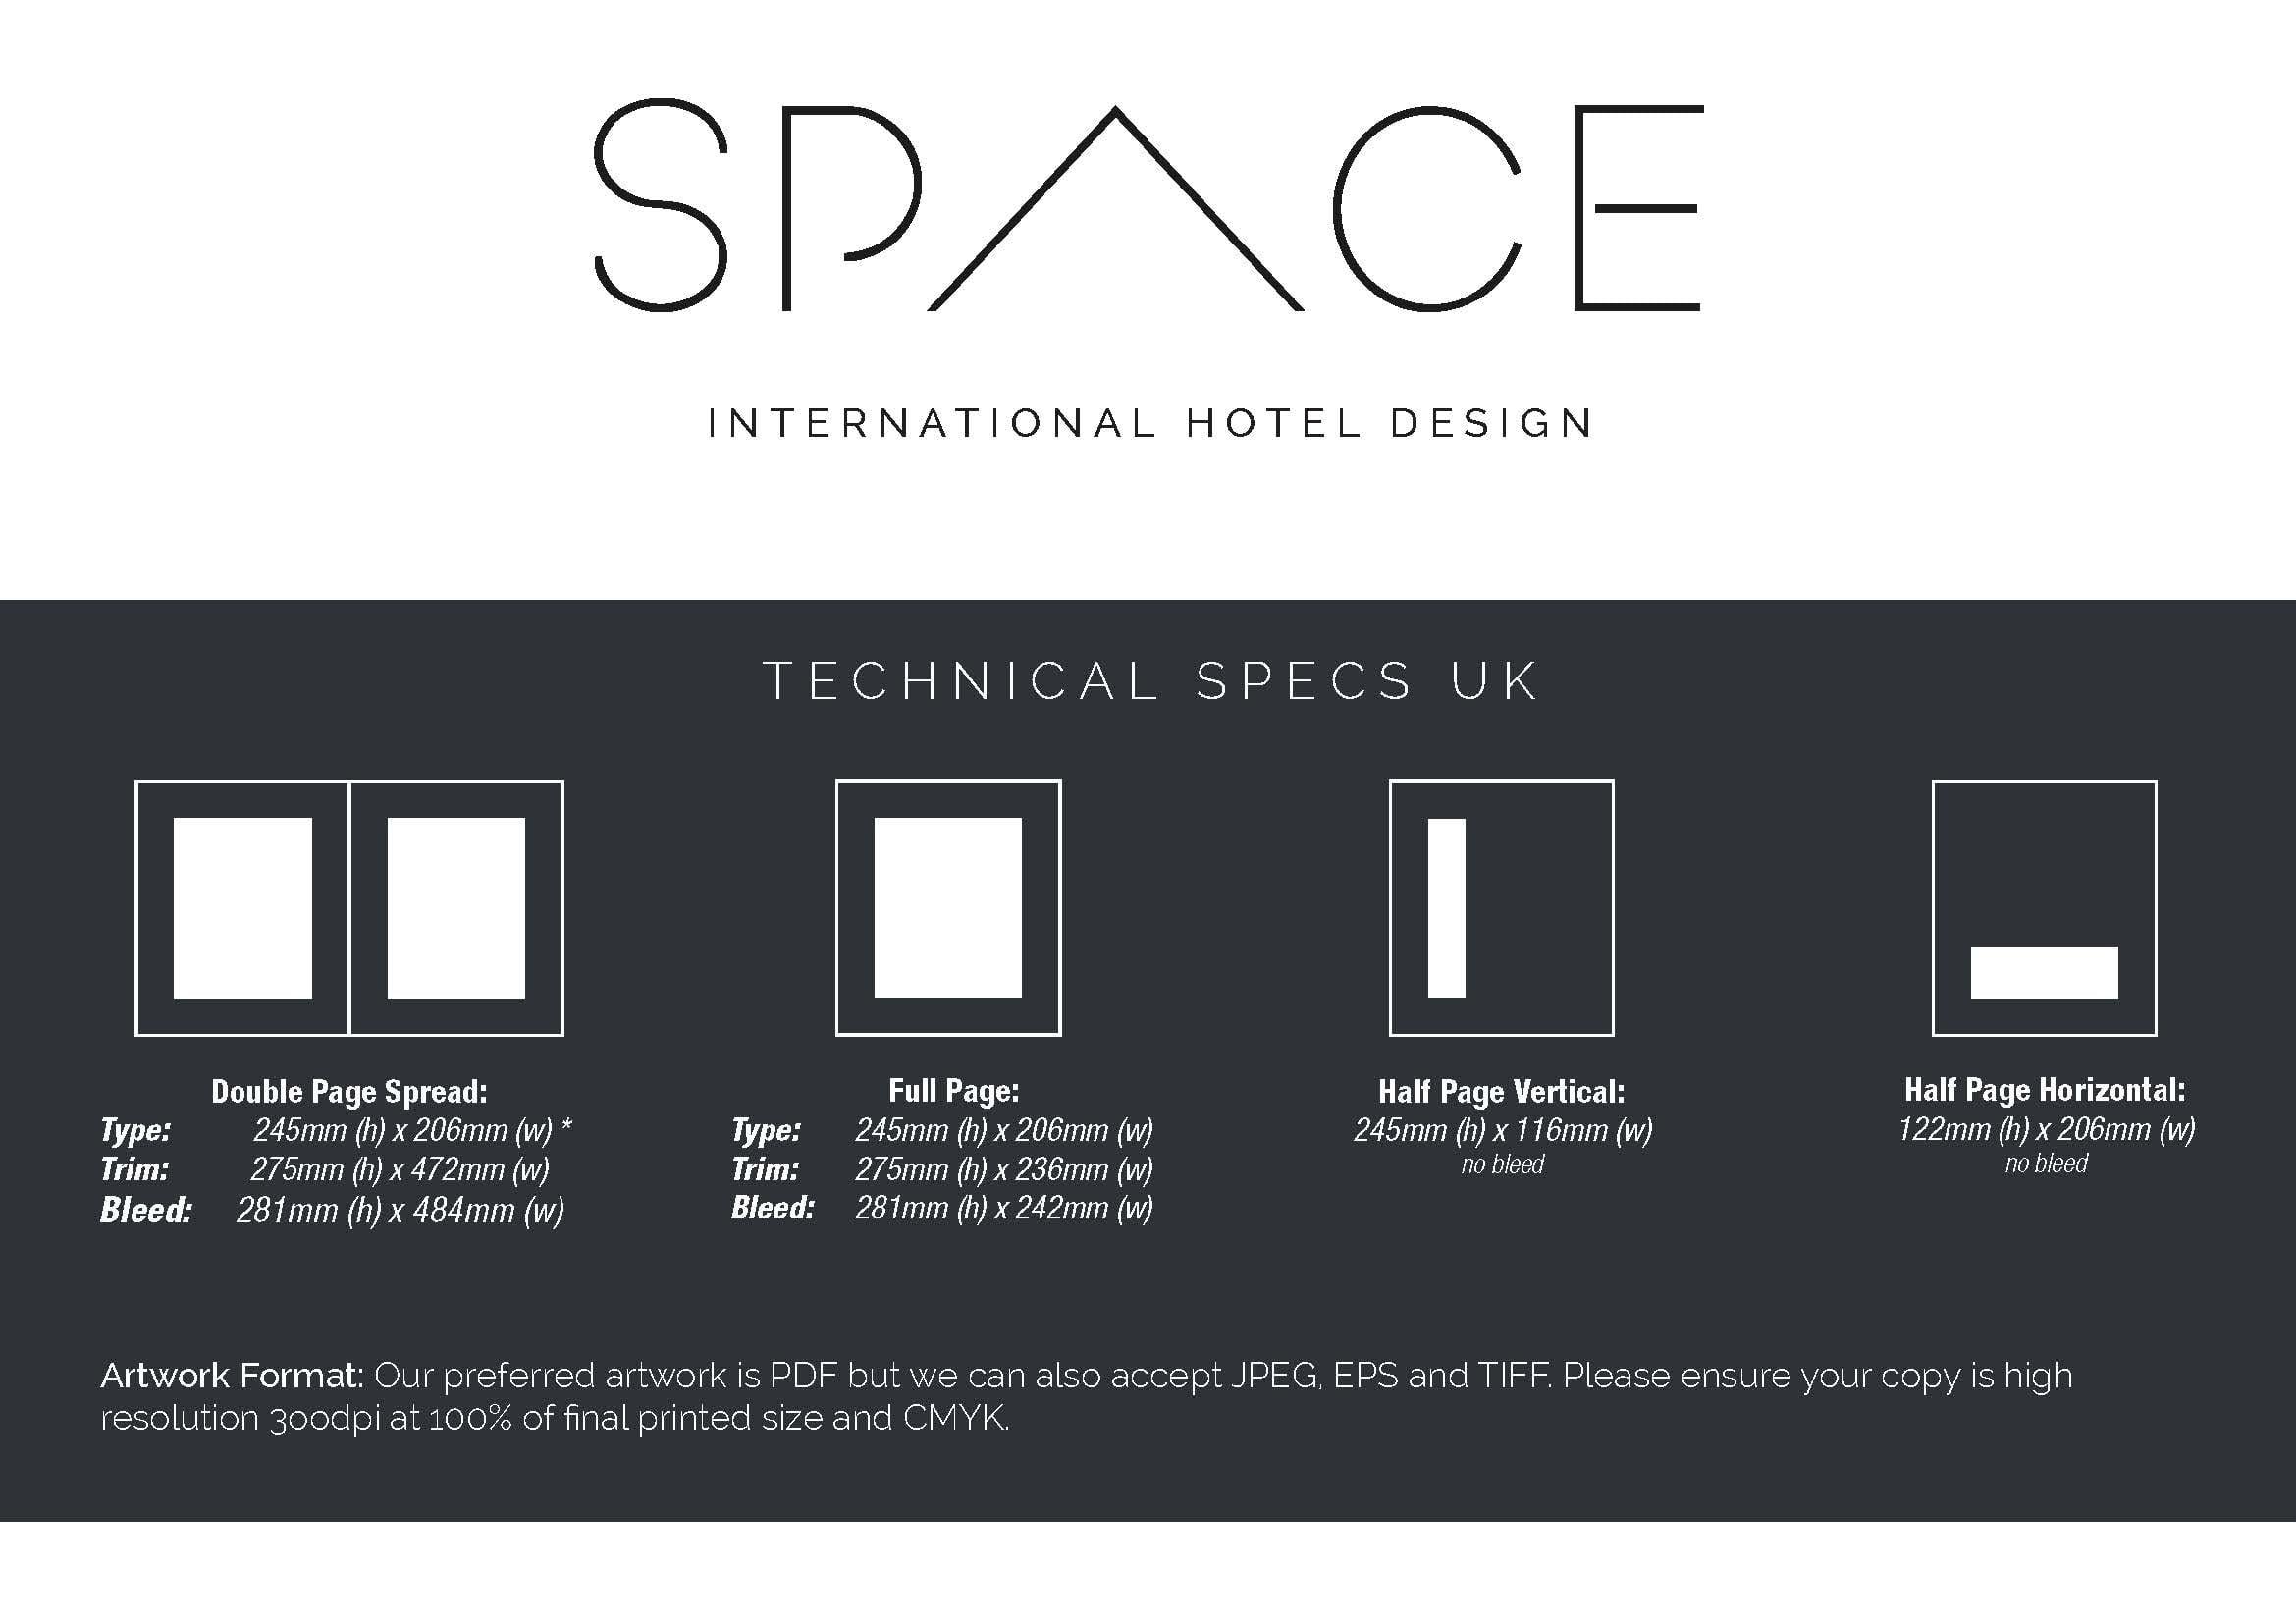 copy spec space international hotel design